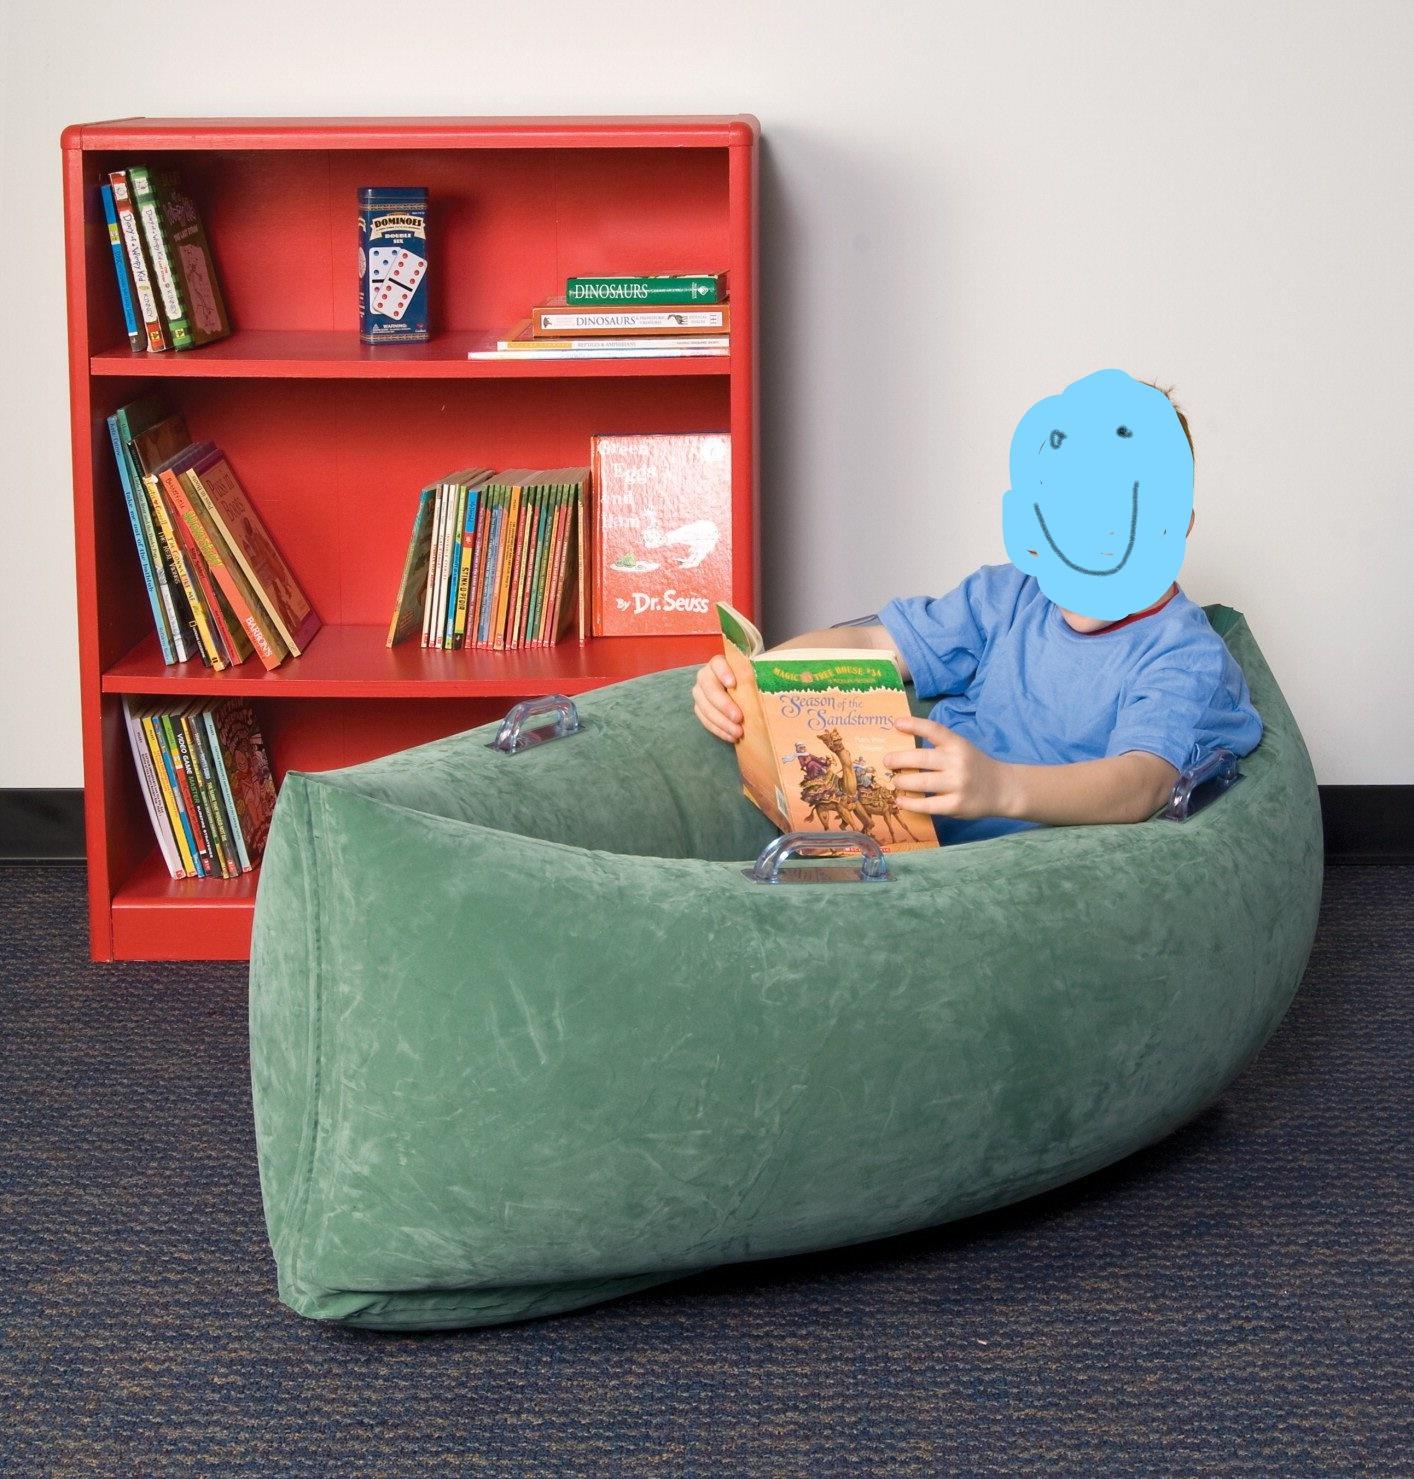 Inkedpeapod_inflatable_self_calming_station_LIedit.jpg